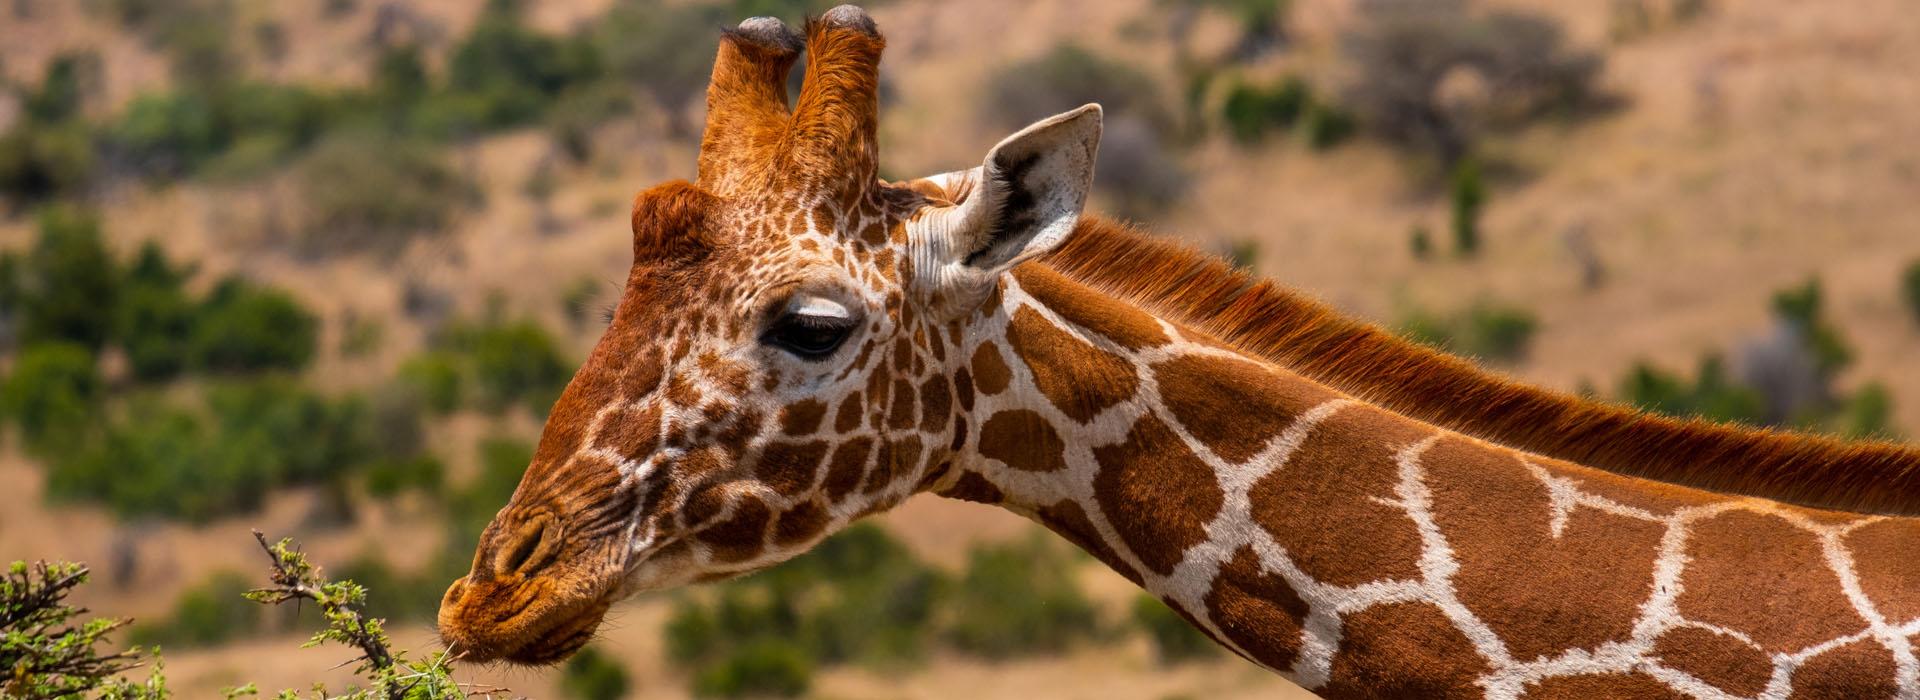 African Adventure Specialists - Samburu National Park Destination